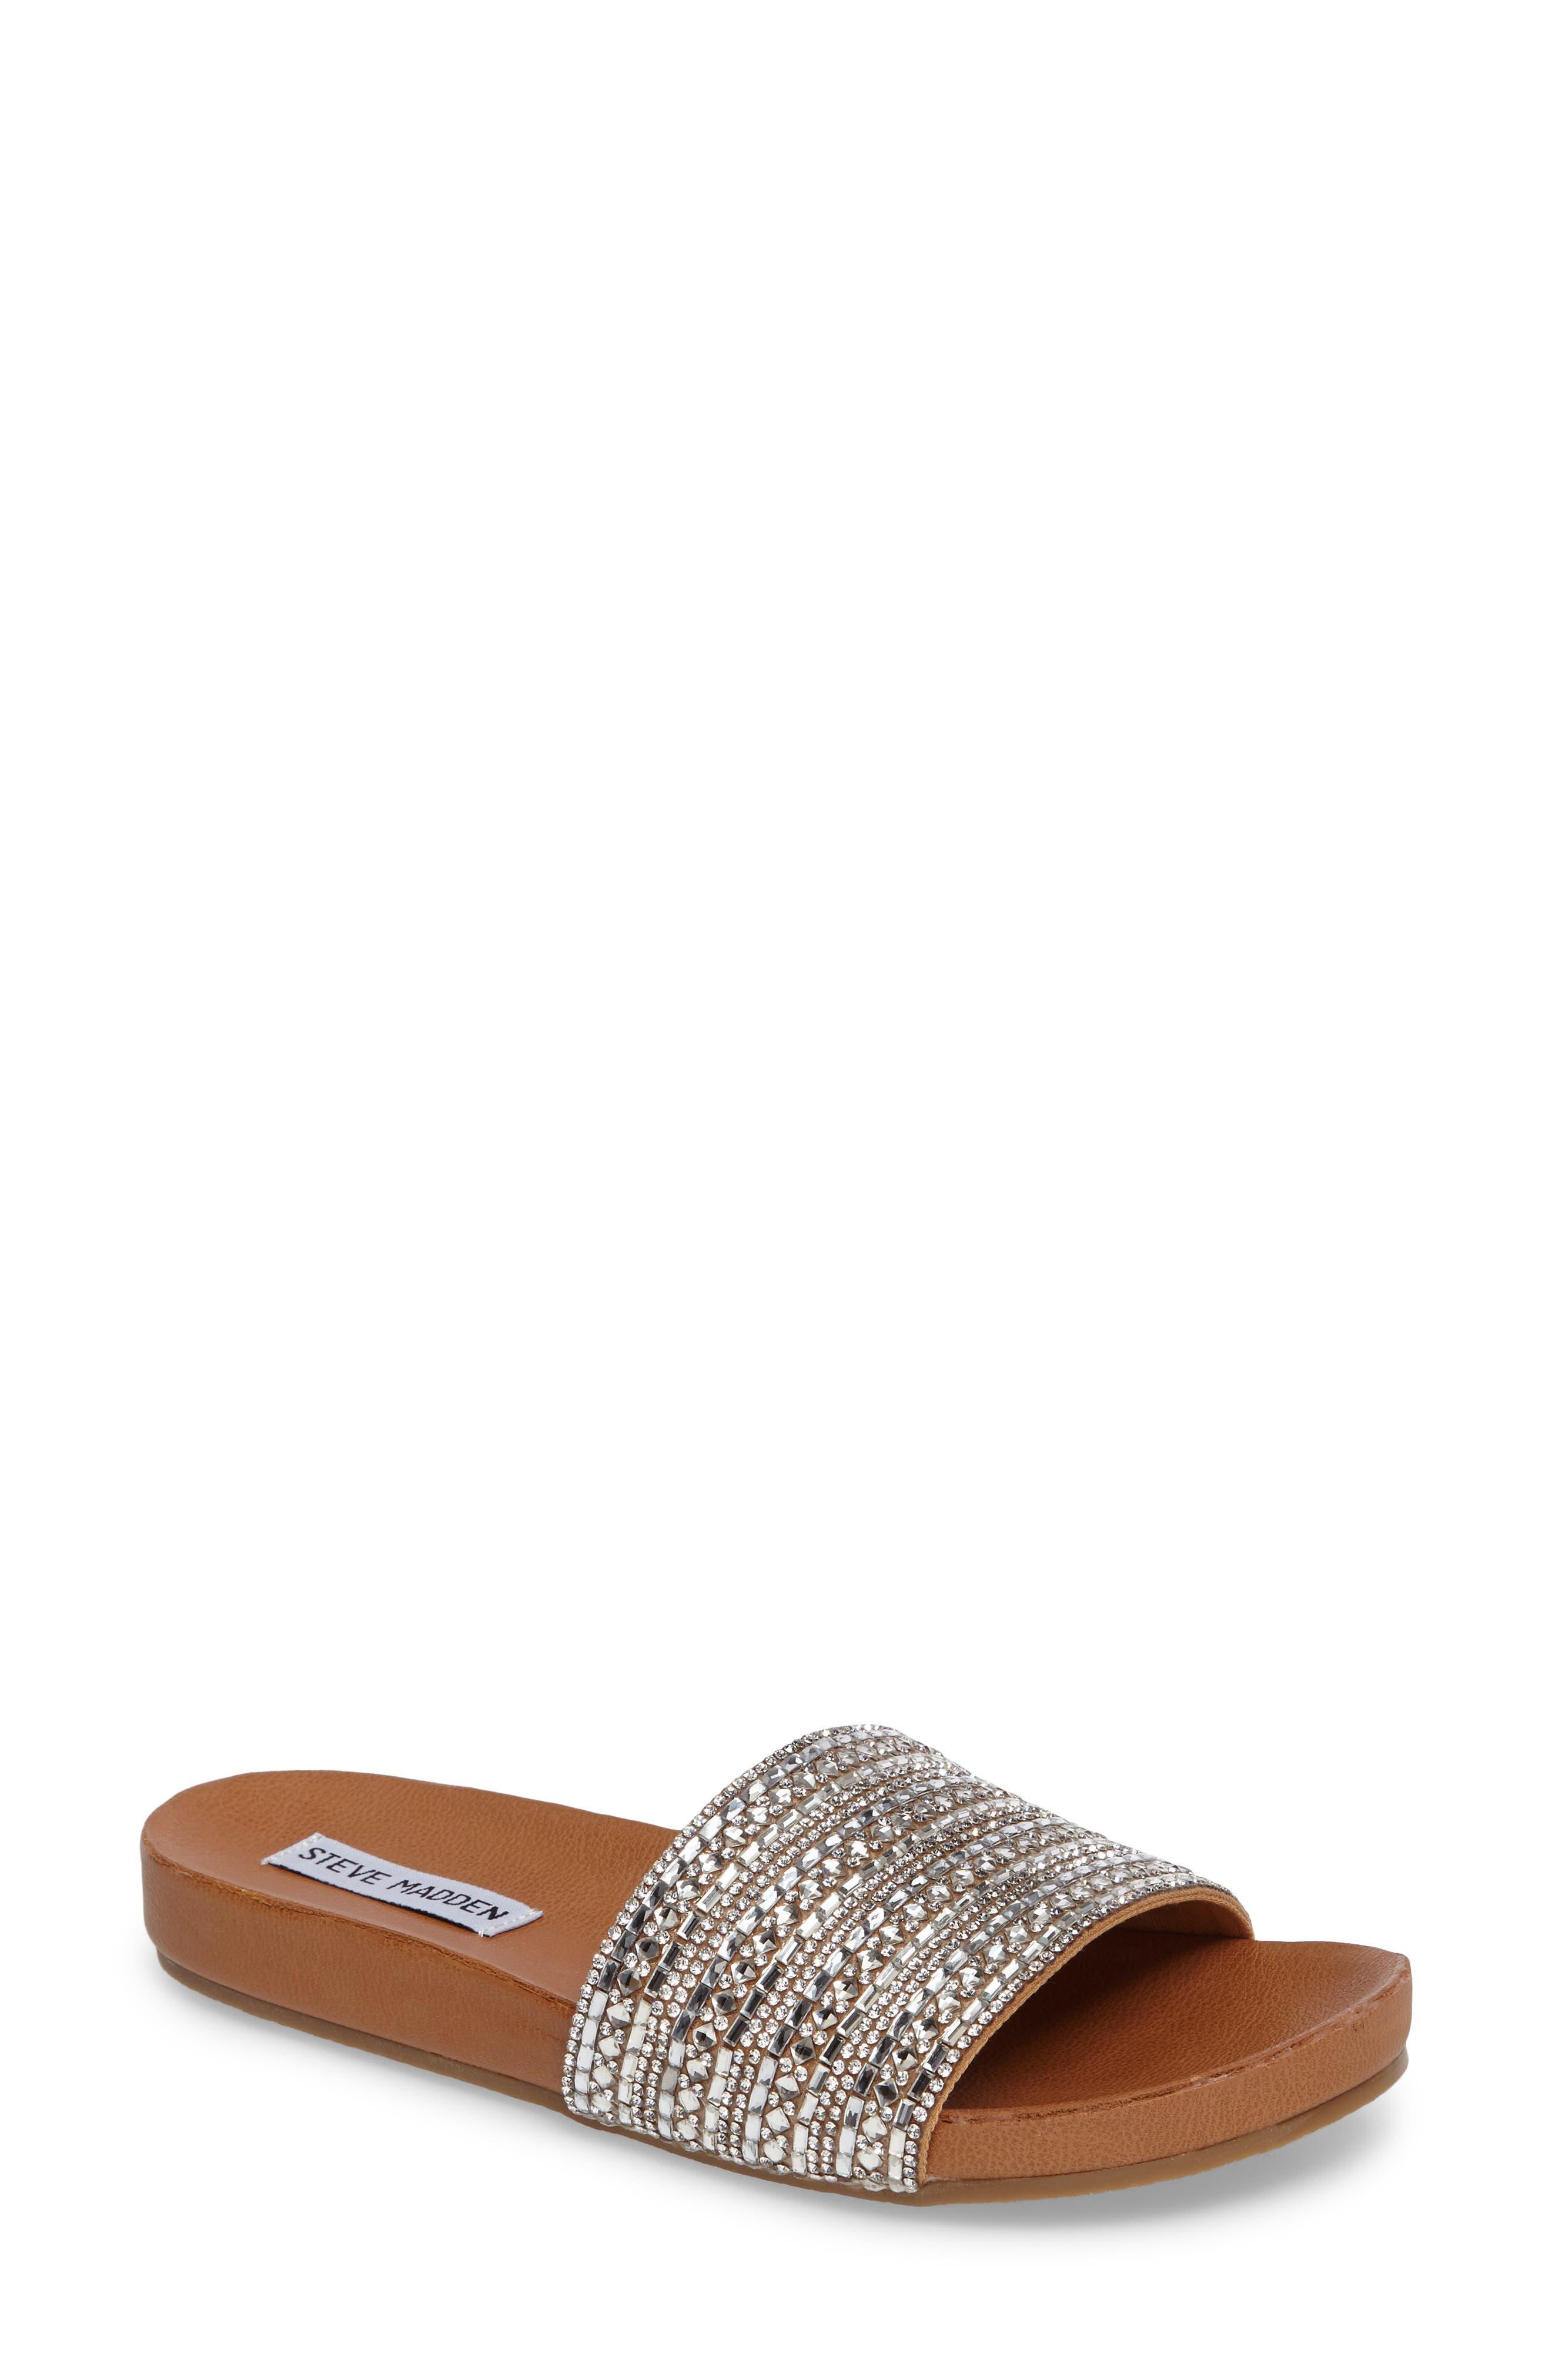 Dazzle Embellished Slide Sandal,                         Main,                         color, Rhinestone